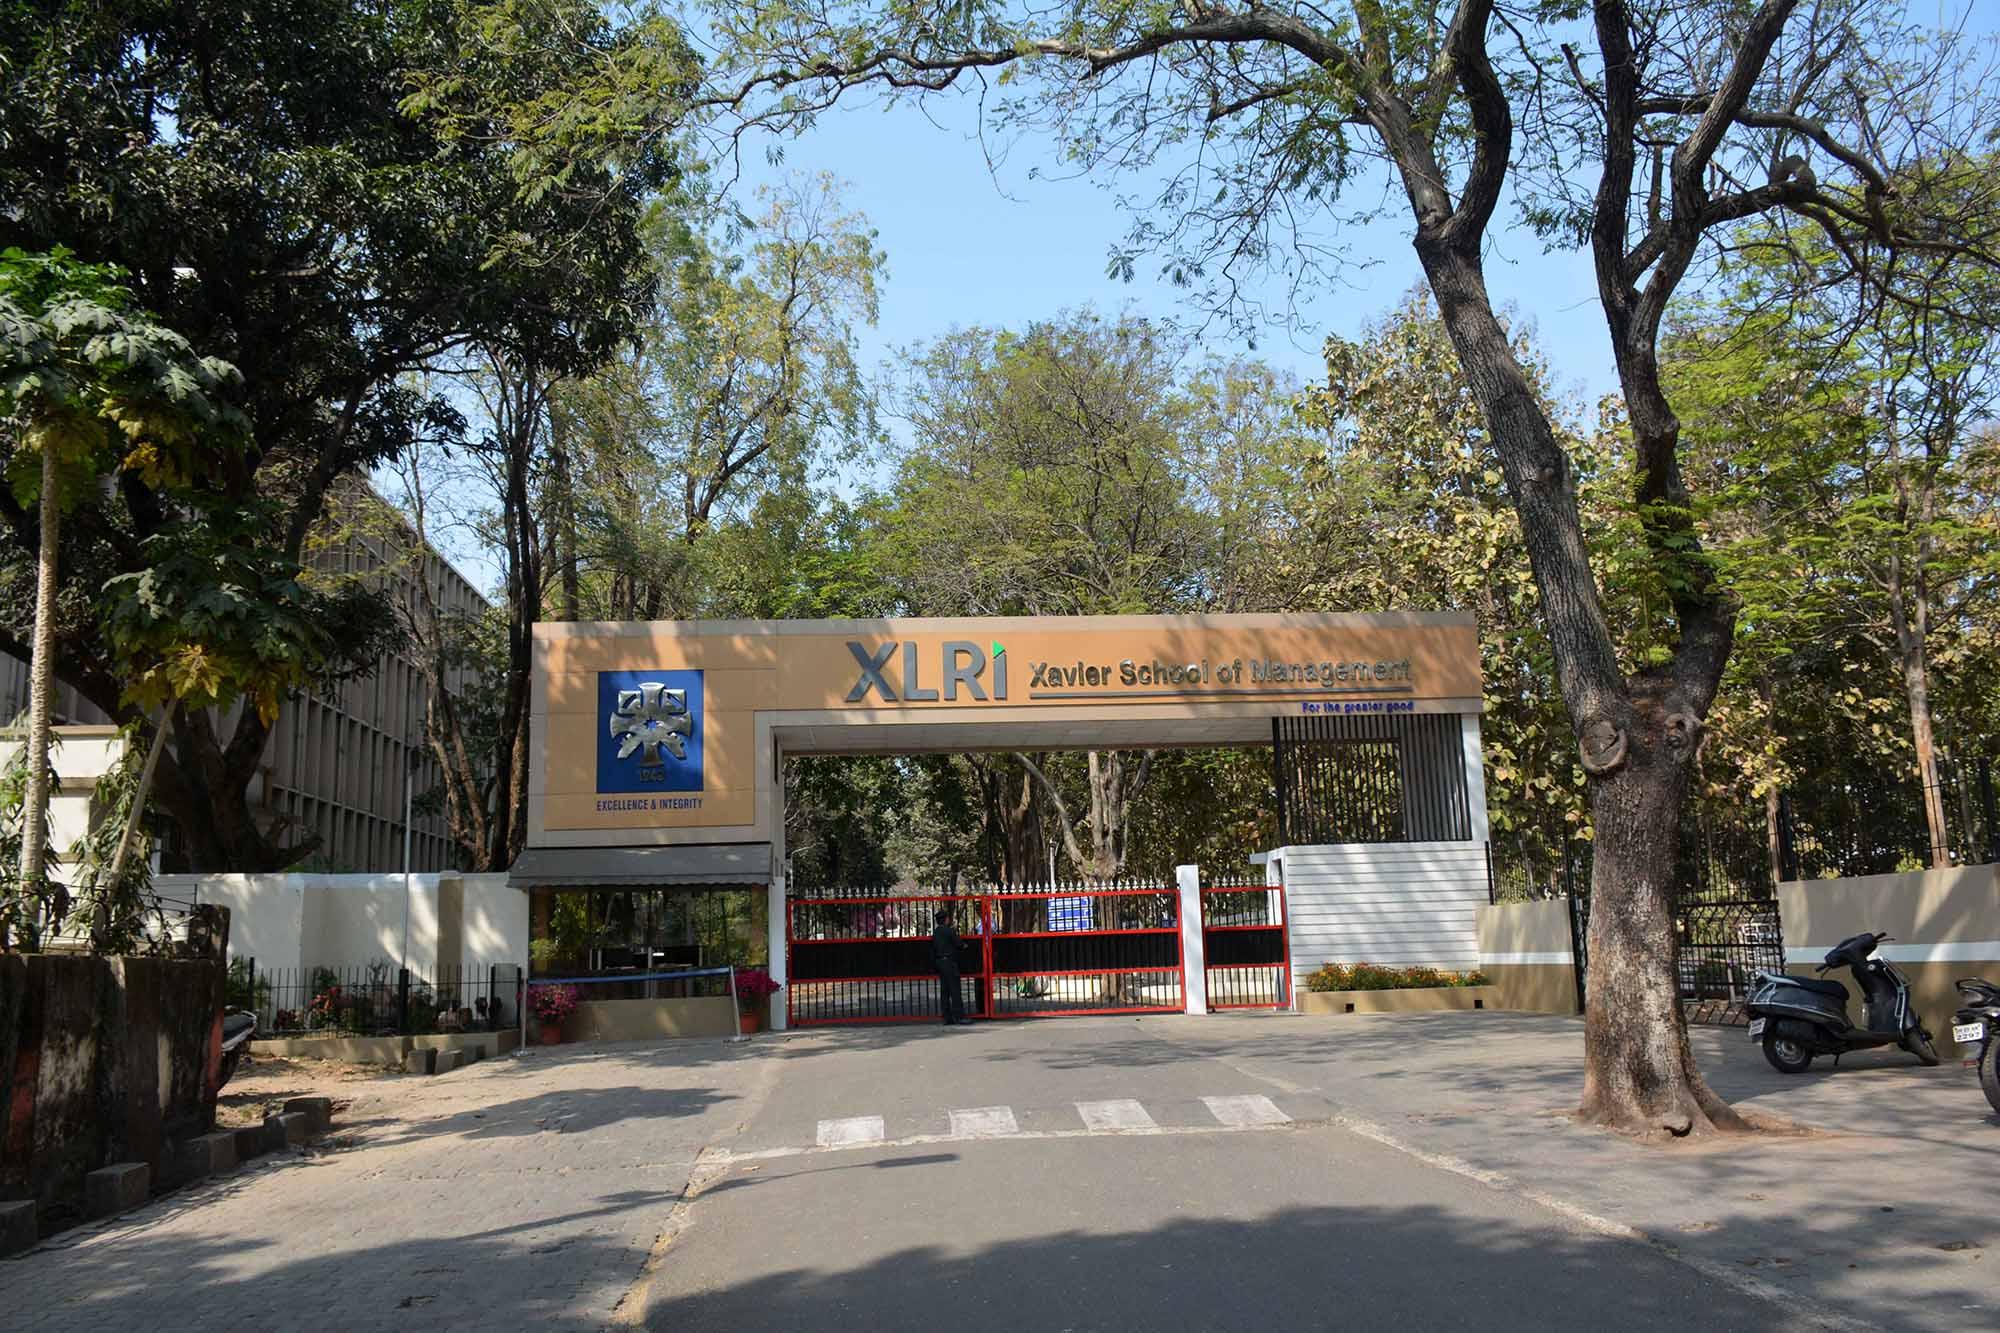 XLRI campus at Circuit House Area in Jamshedpur.